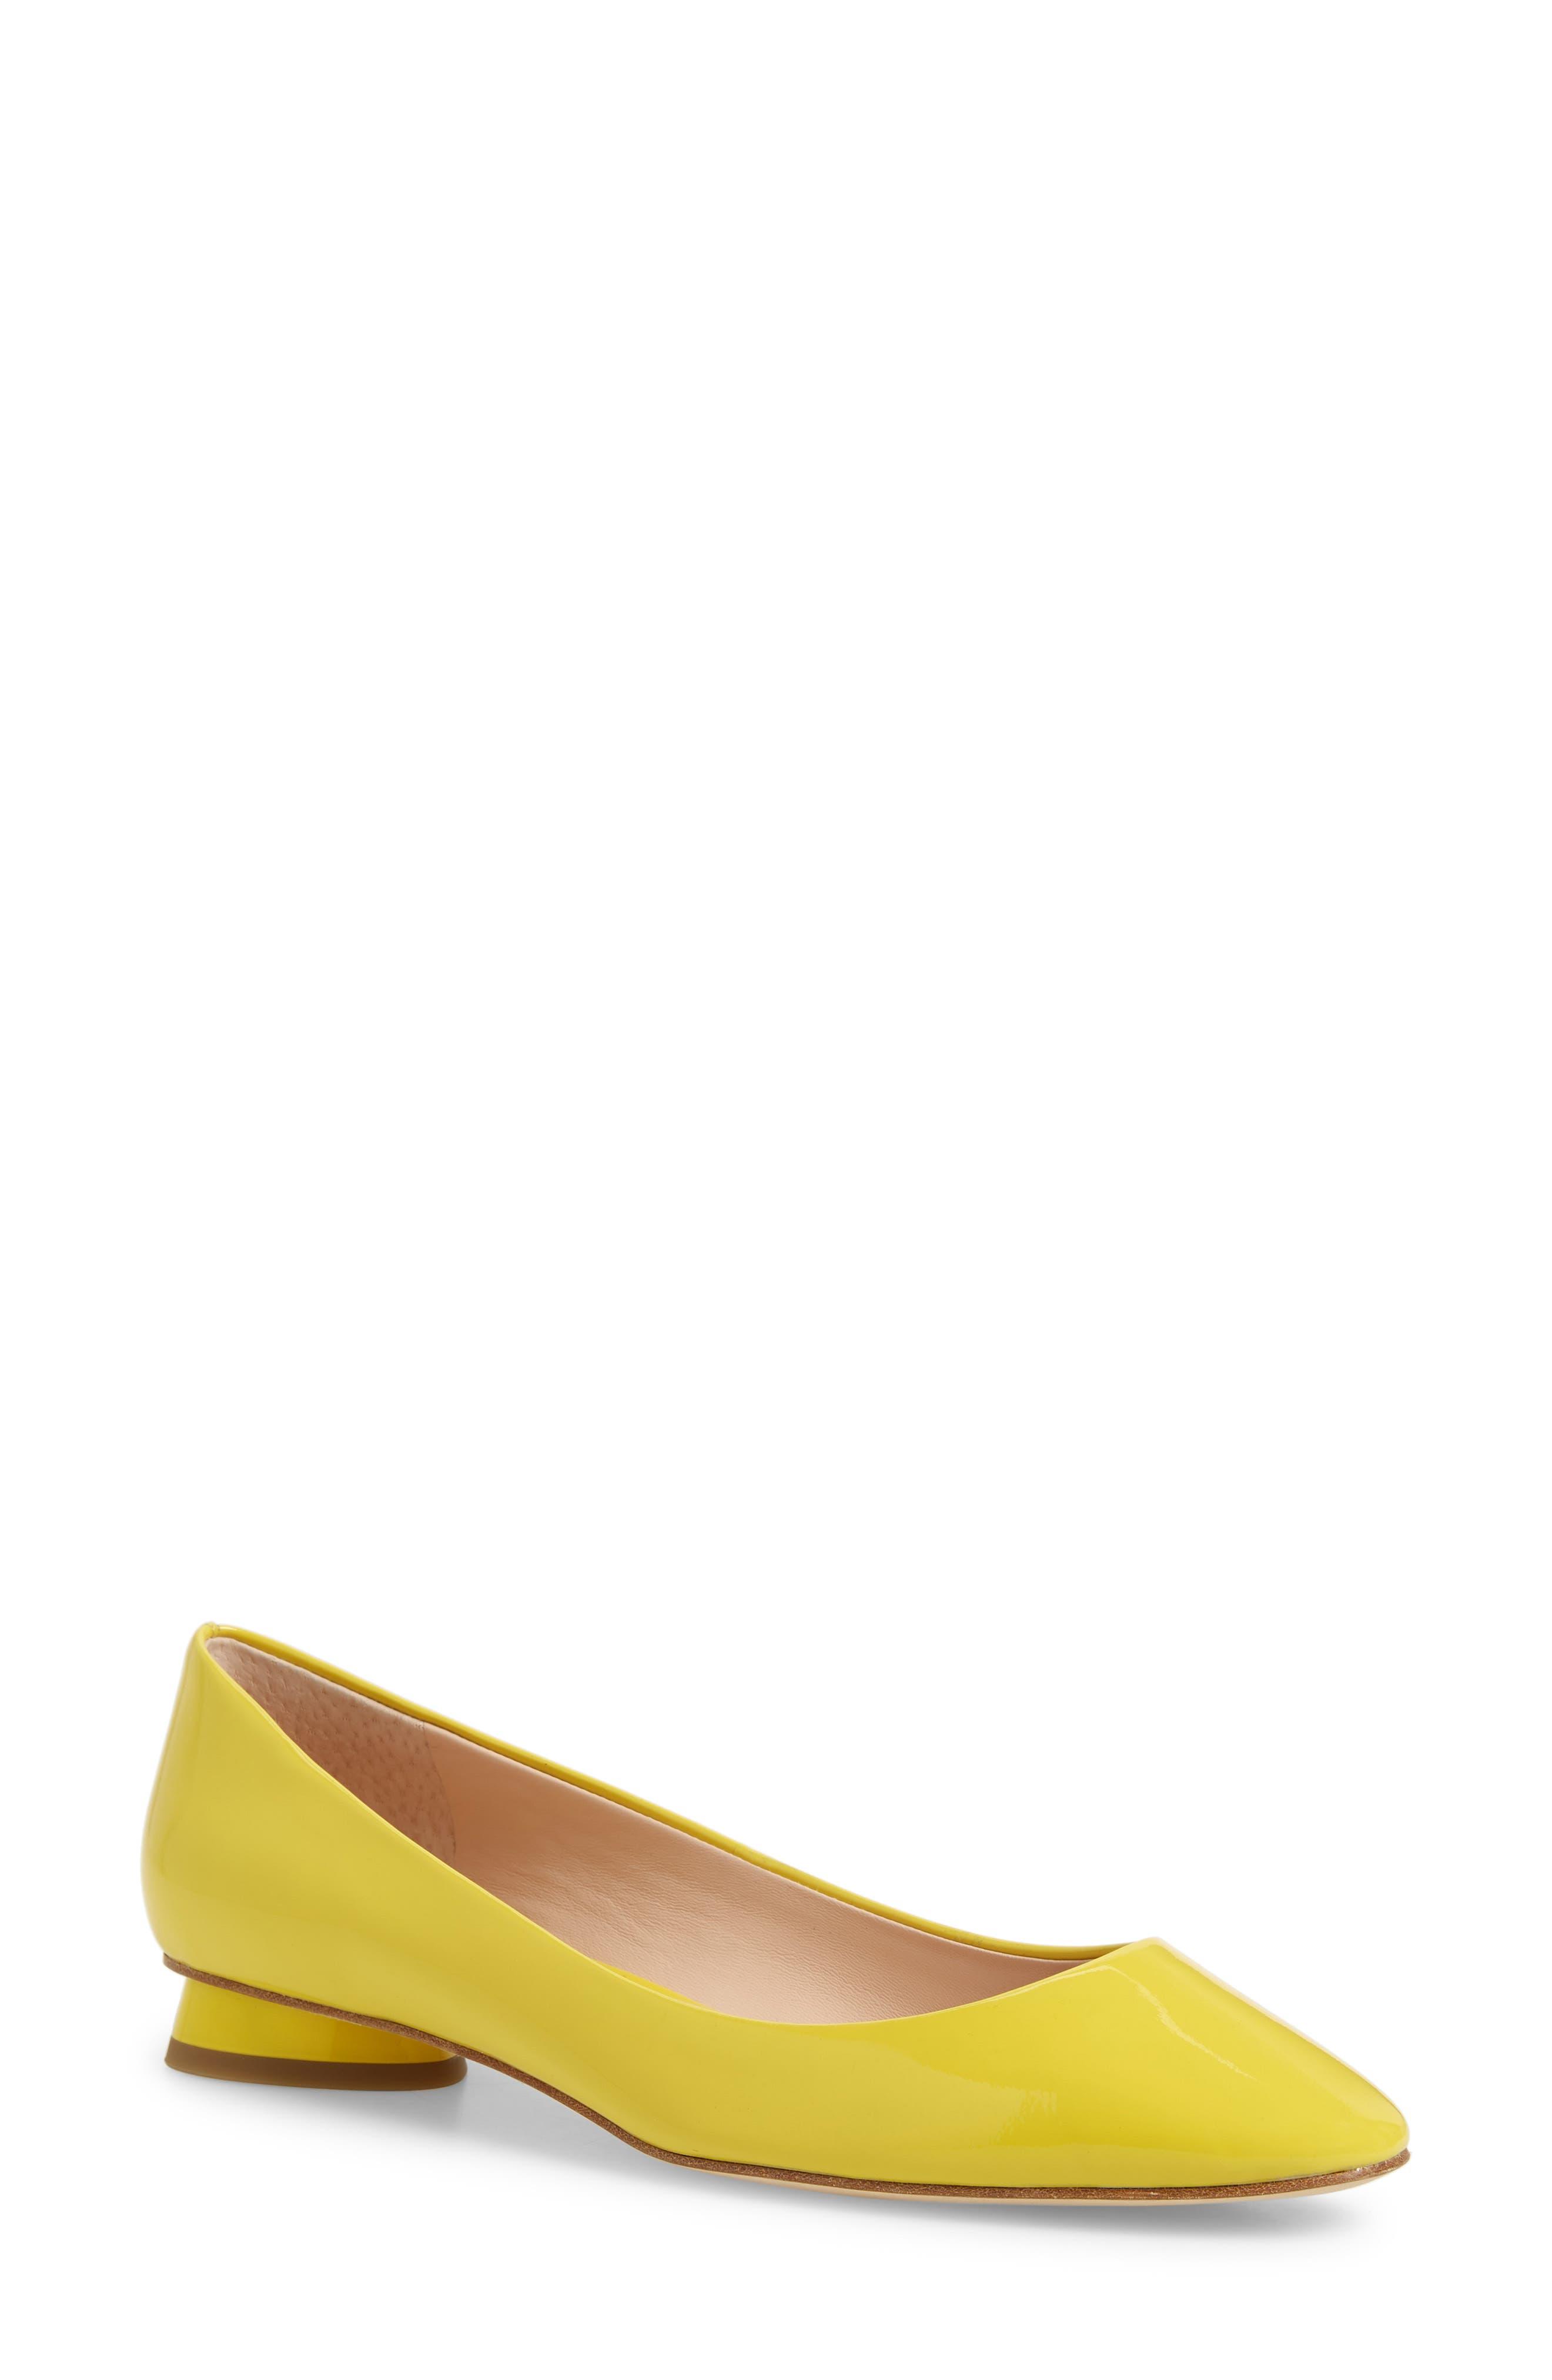 Kate Spade New York Fallyn Skimmer Flat, Yellow